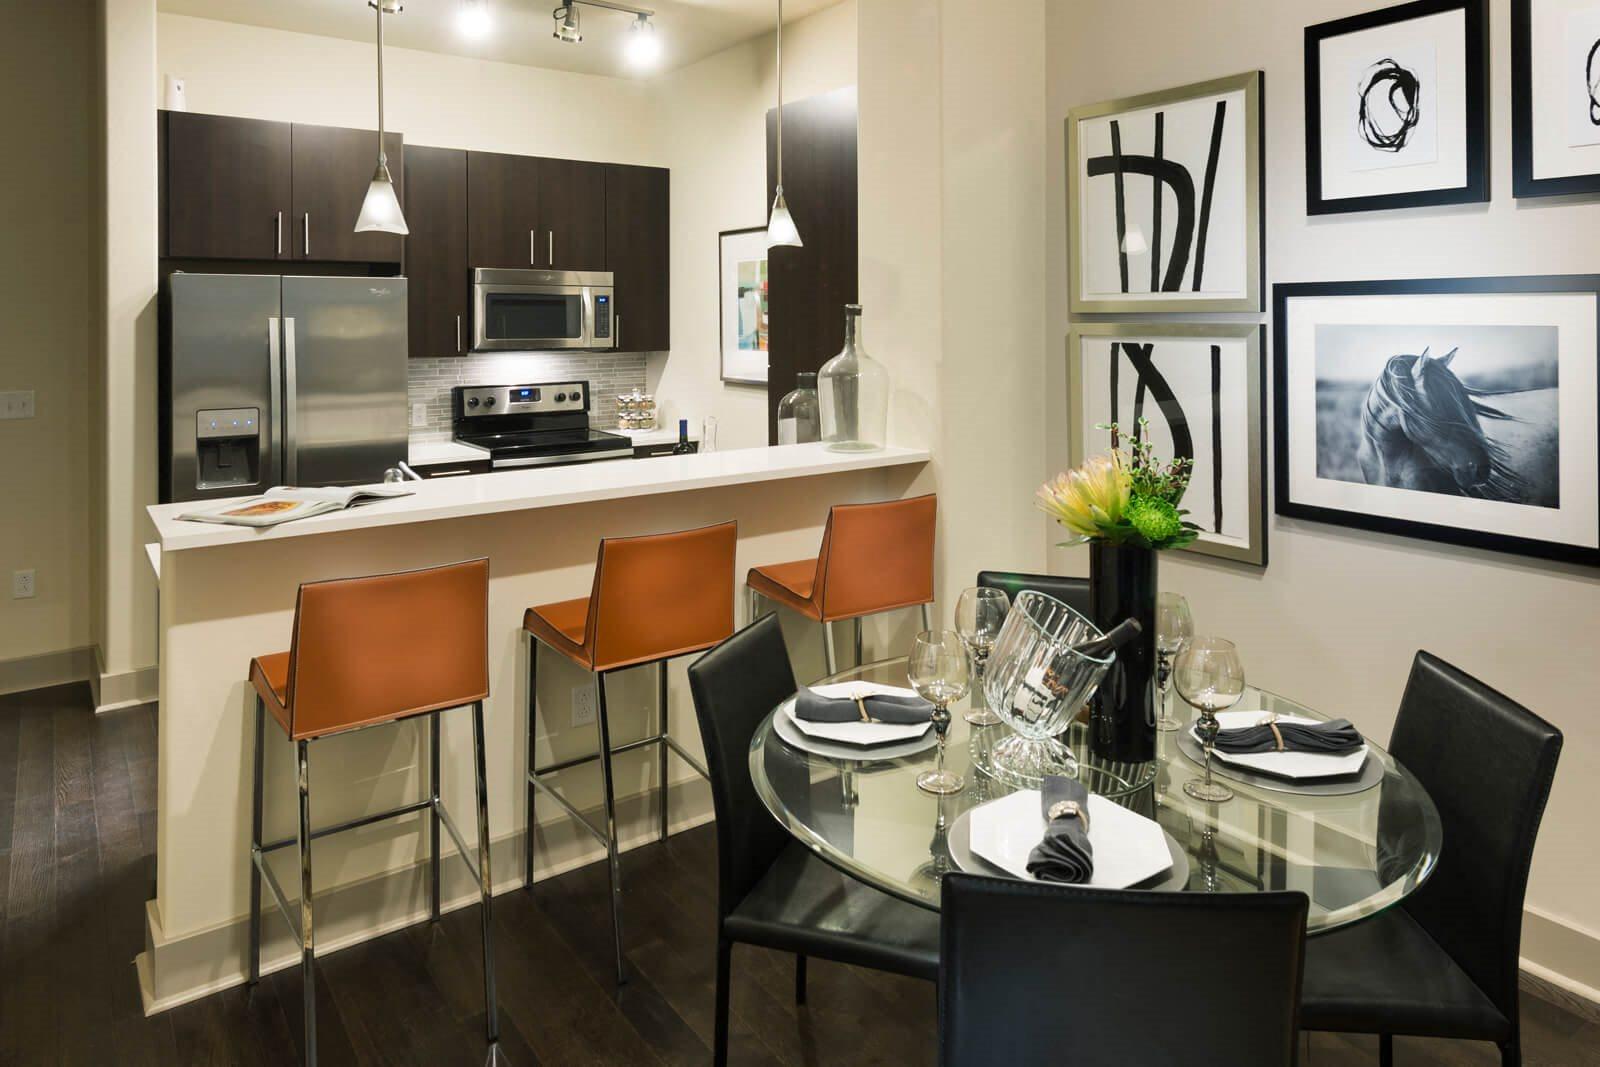 White Quartz Counters In Kitchen at Windsor at Cambridge Park, 02140, MA